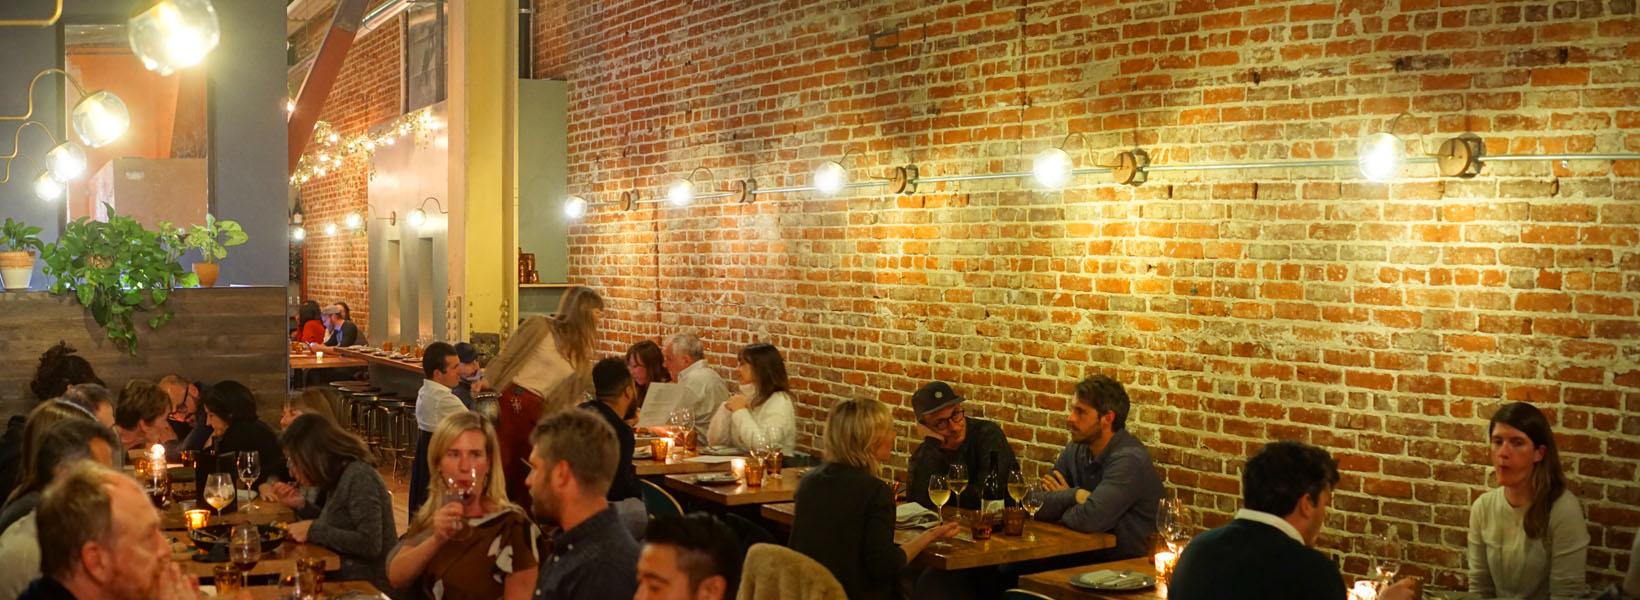 Otoño Dining Room